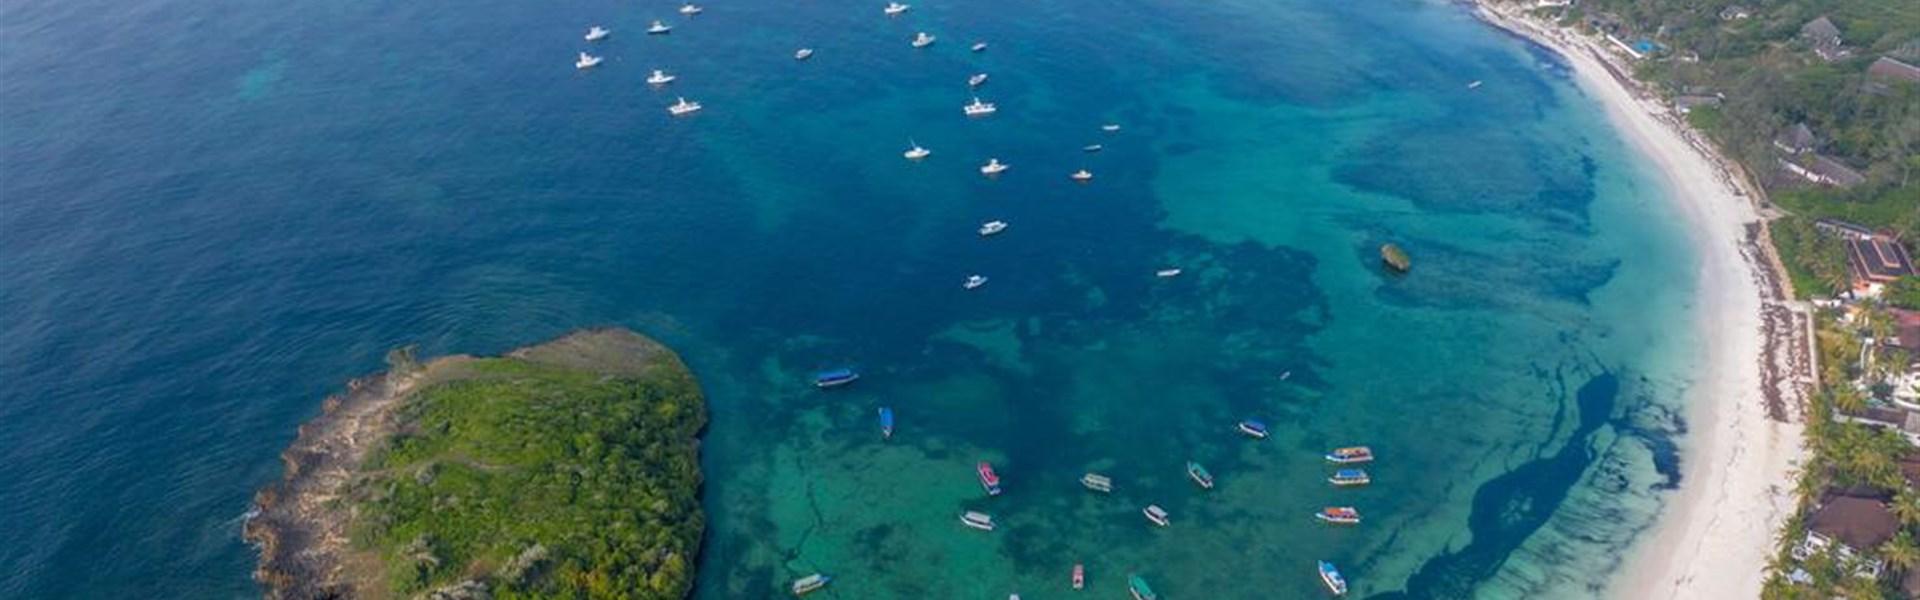 Marco Polo - Turtle Bay Beach Club -